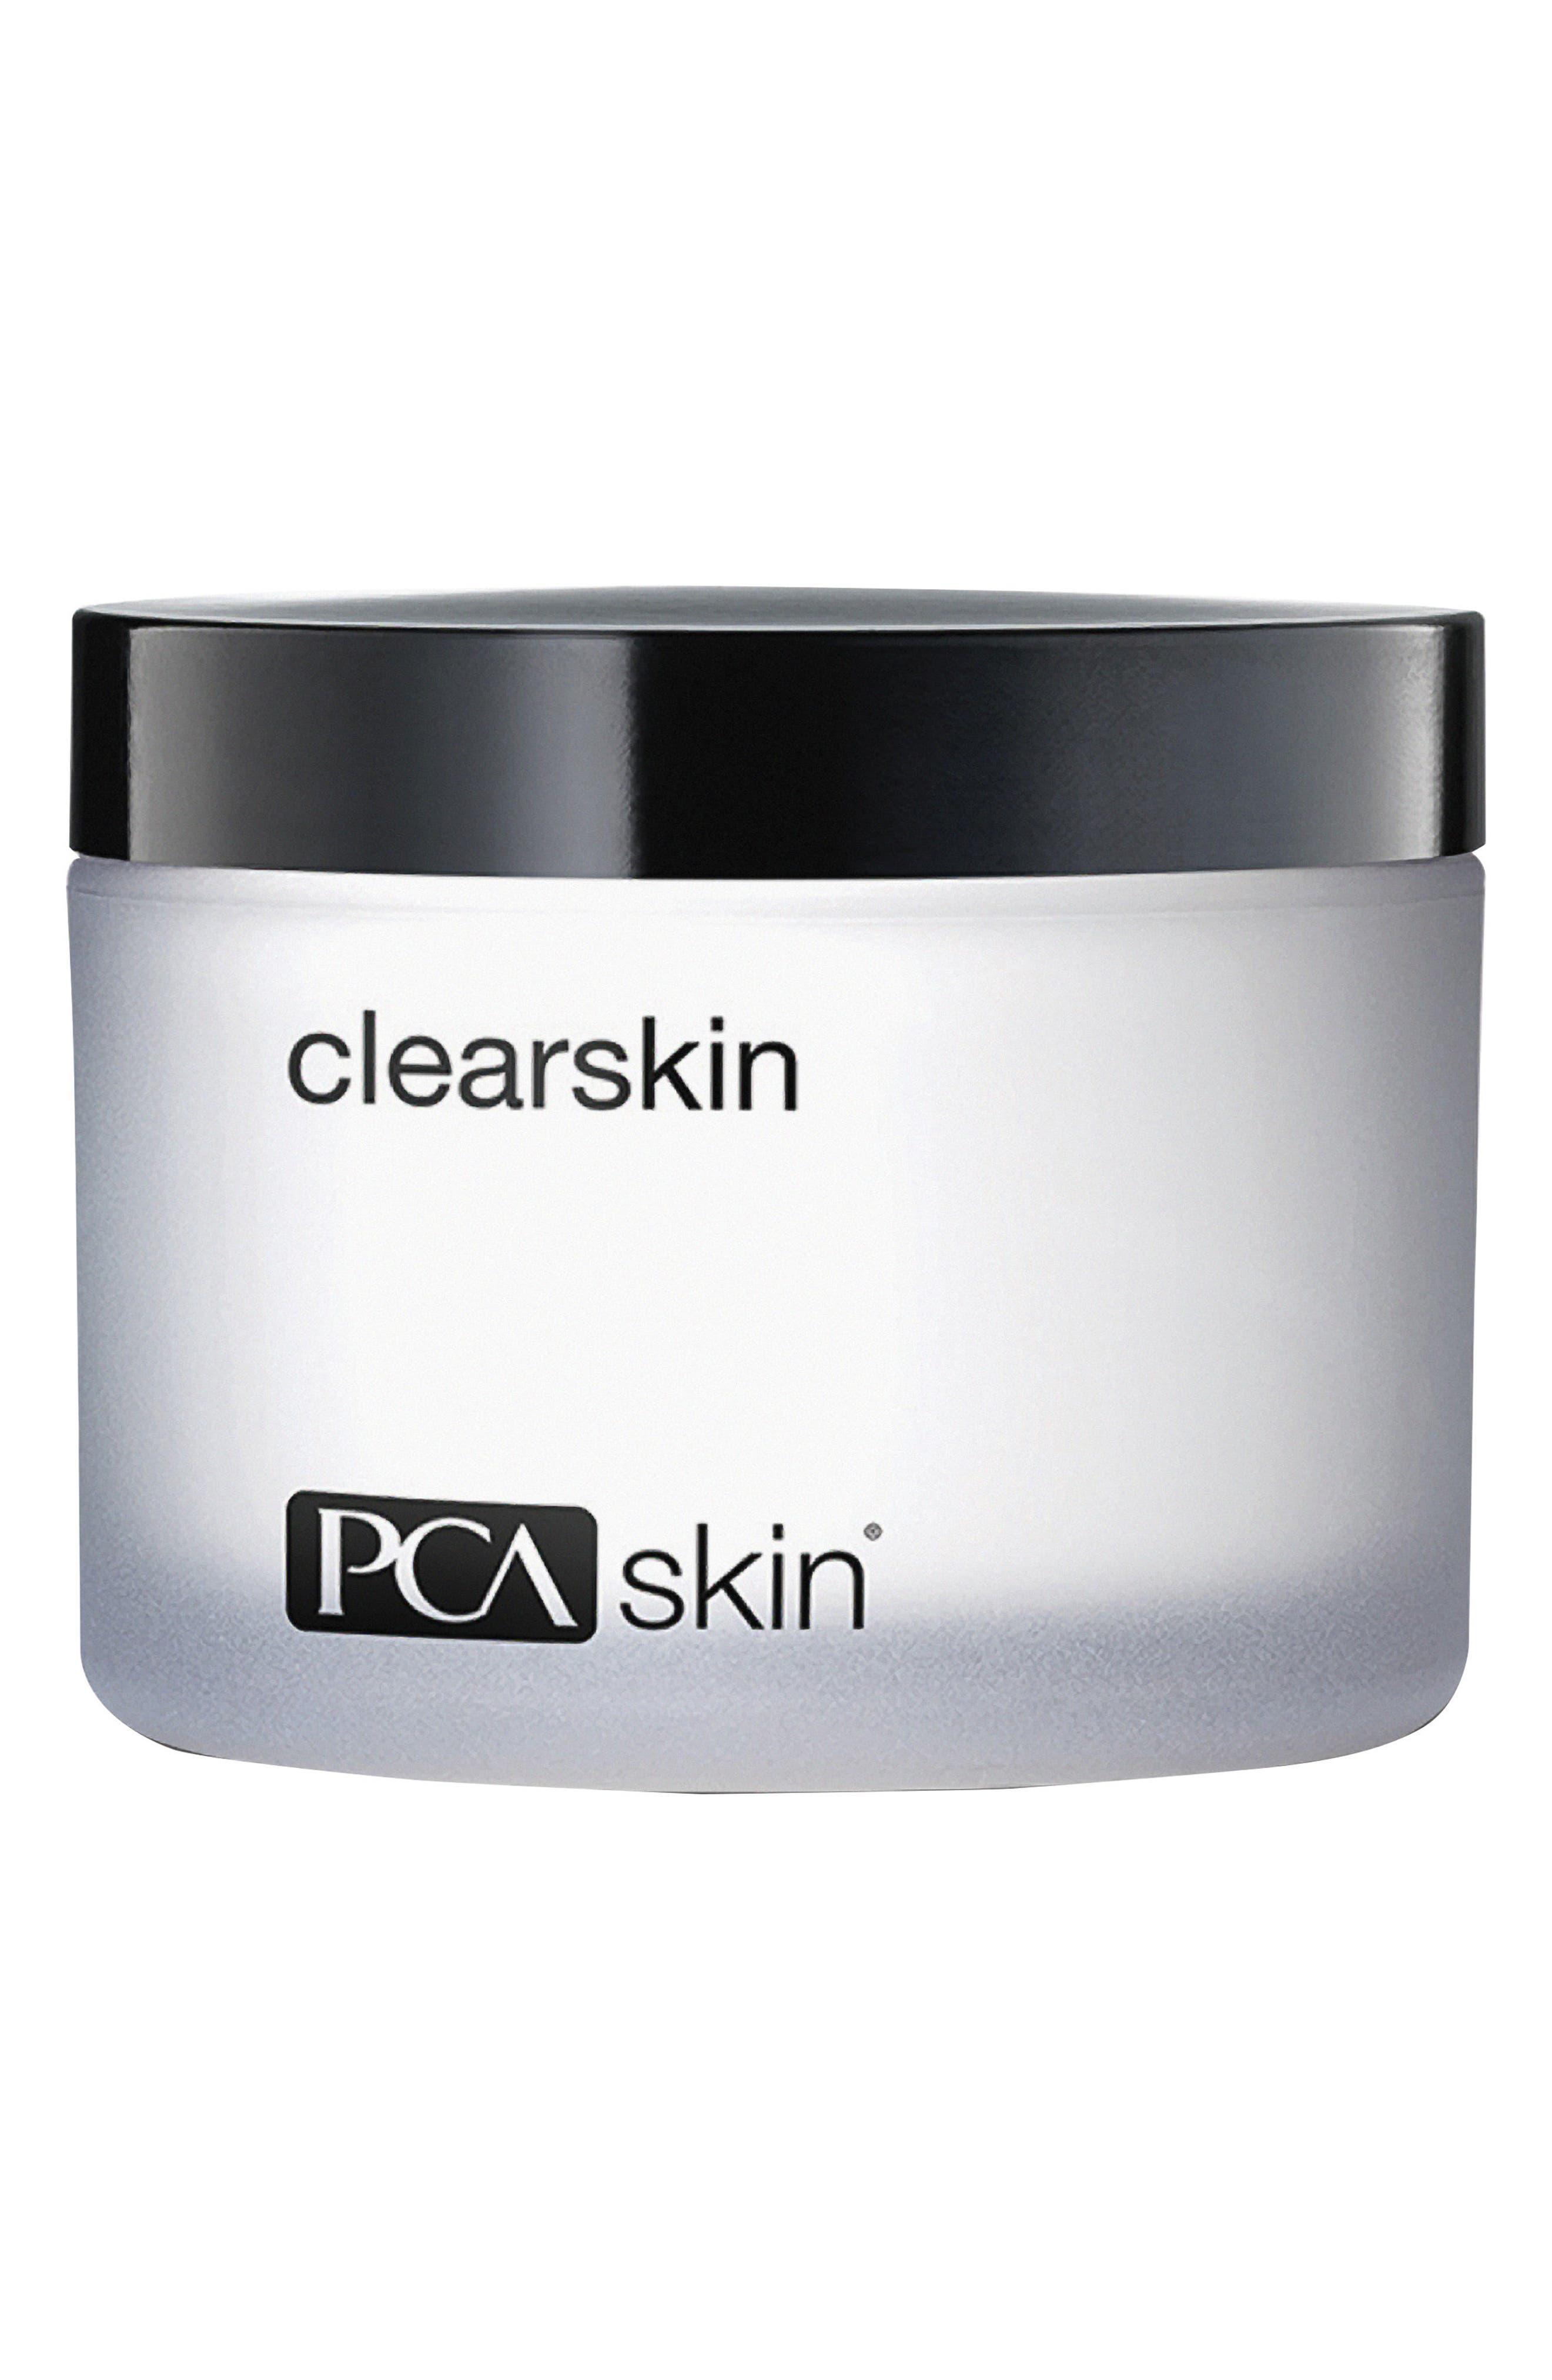 PCA SKIN ClearSkin Moisturizer